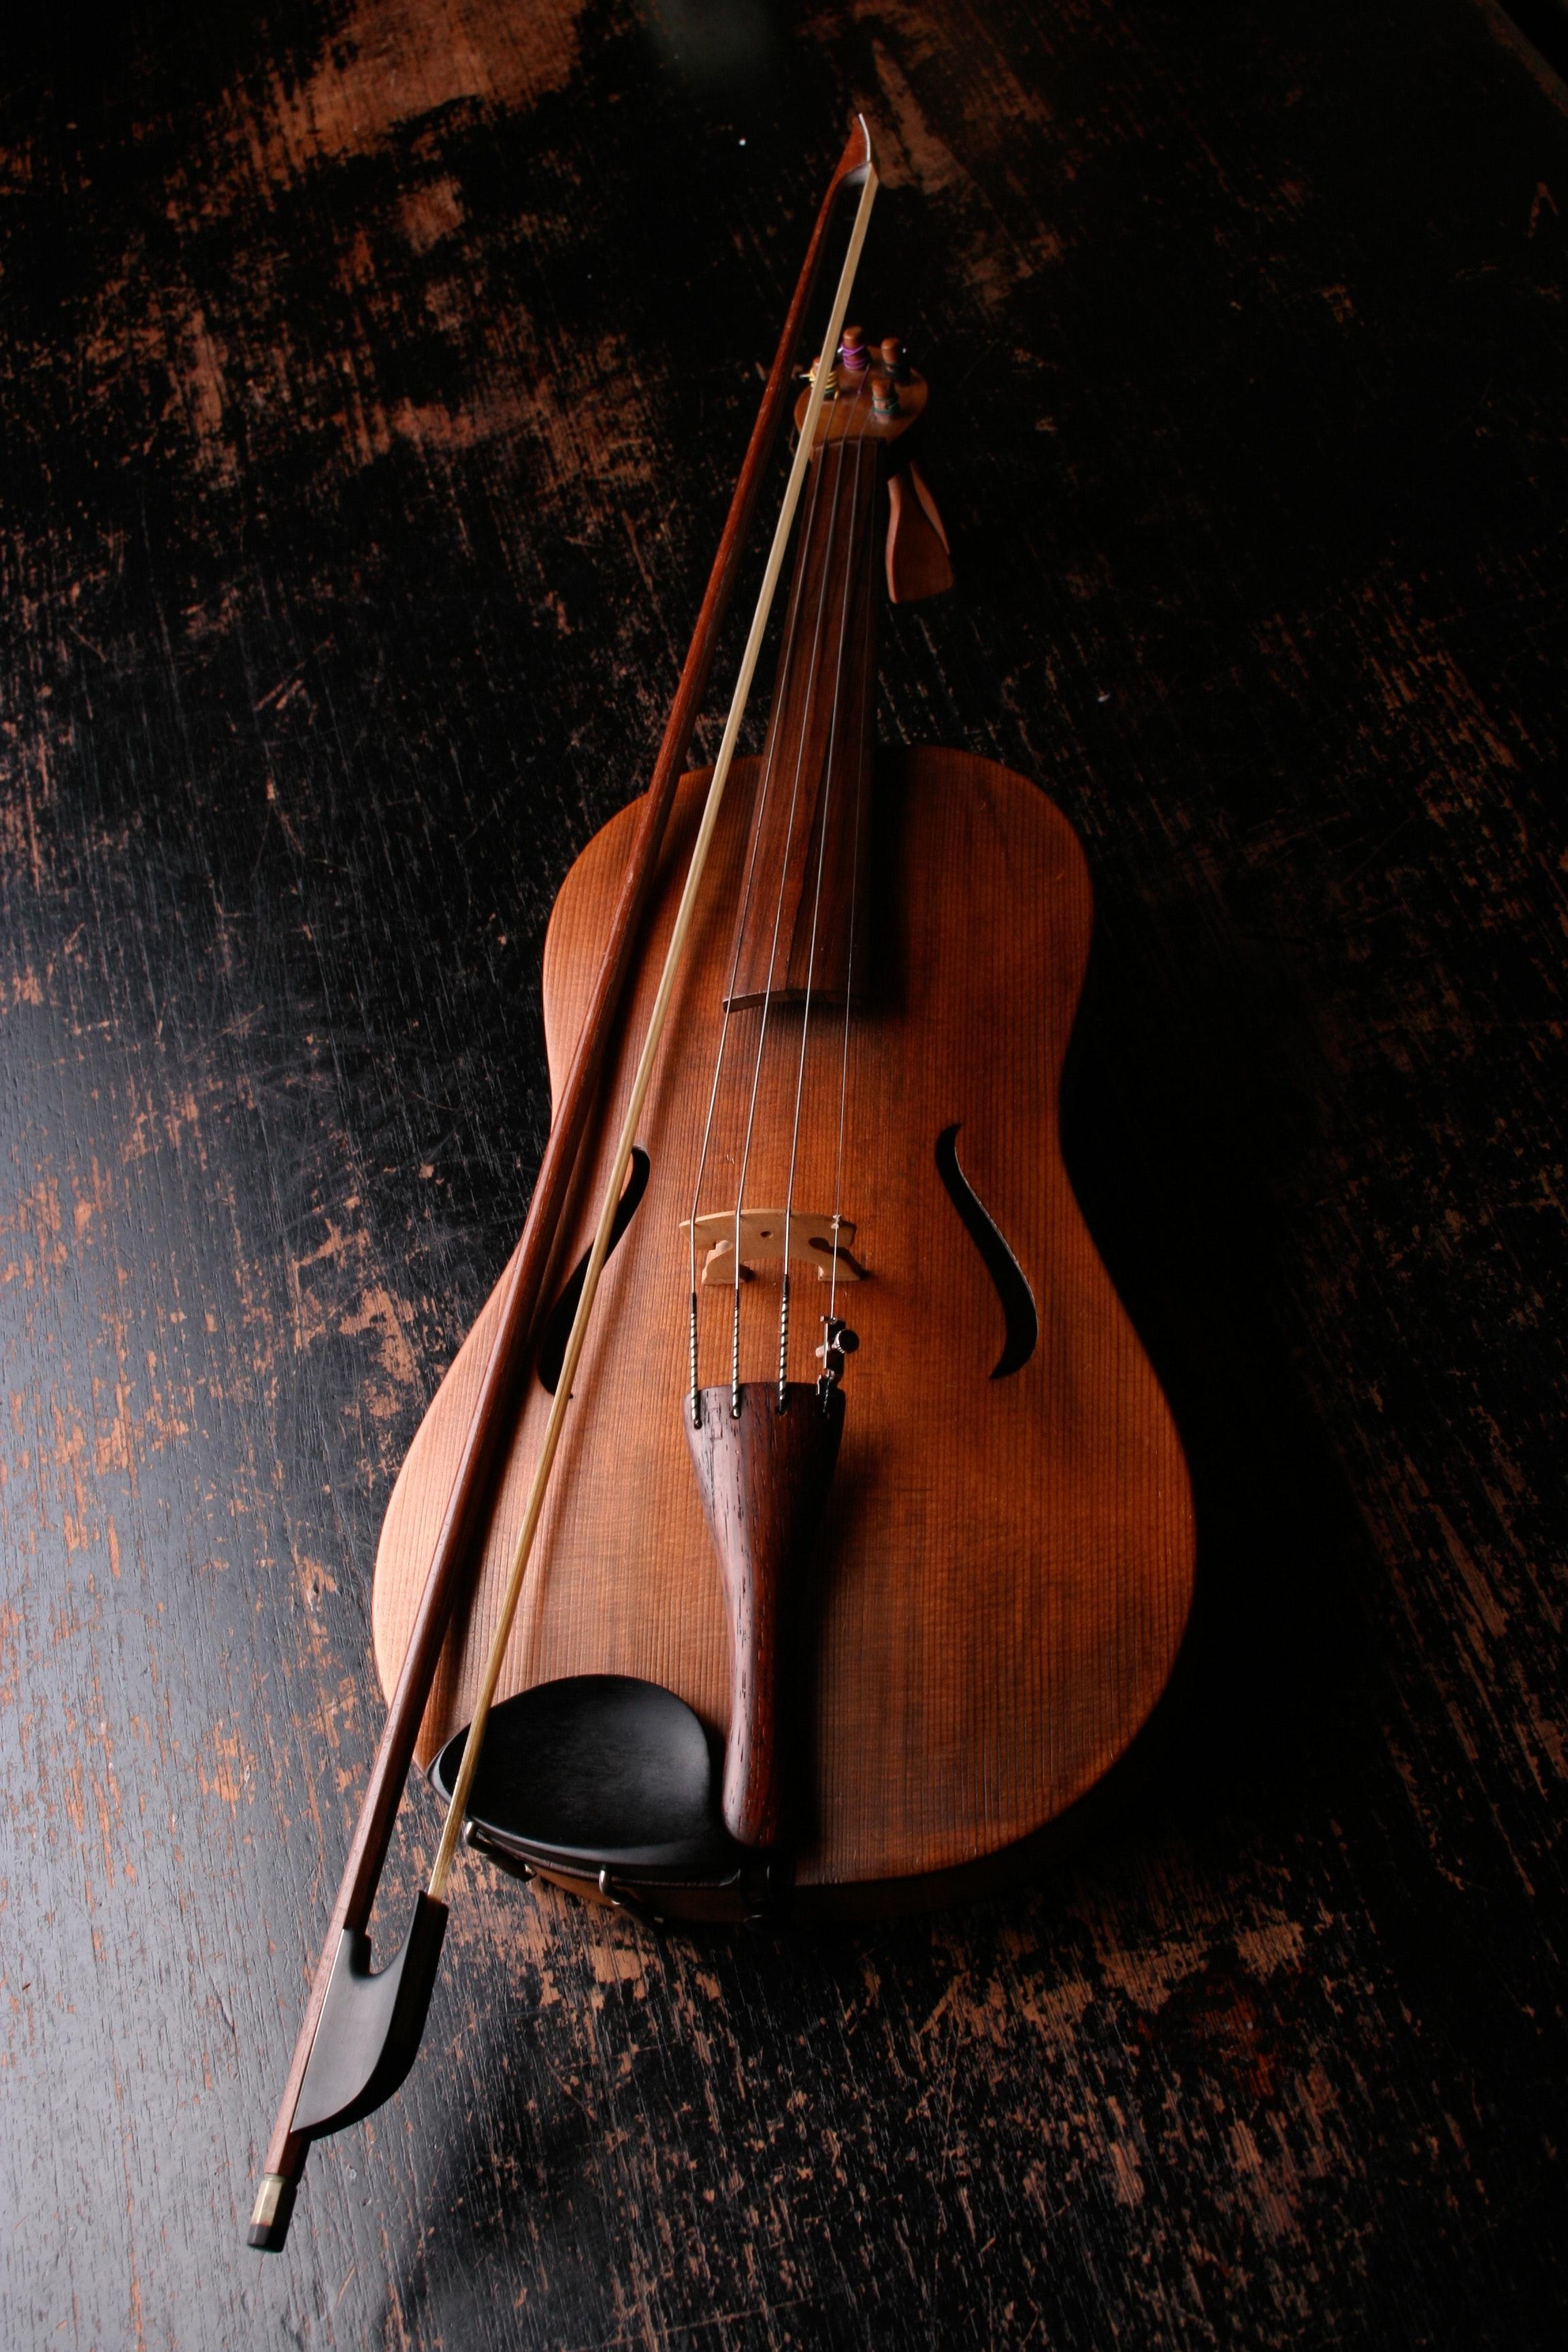 Cedar Top Violin · Free Stock Photo